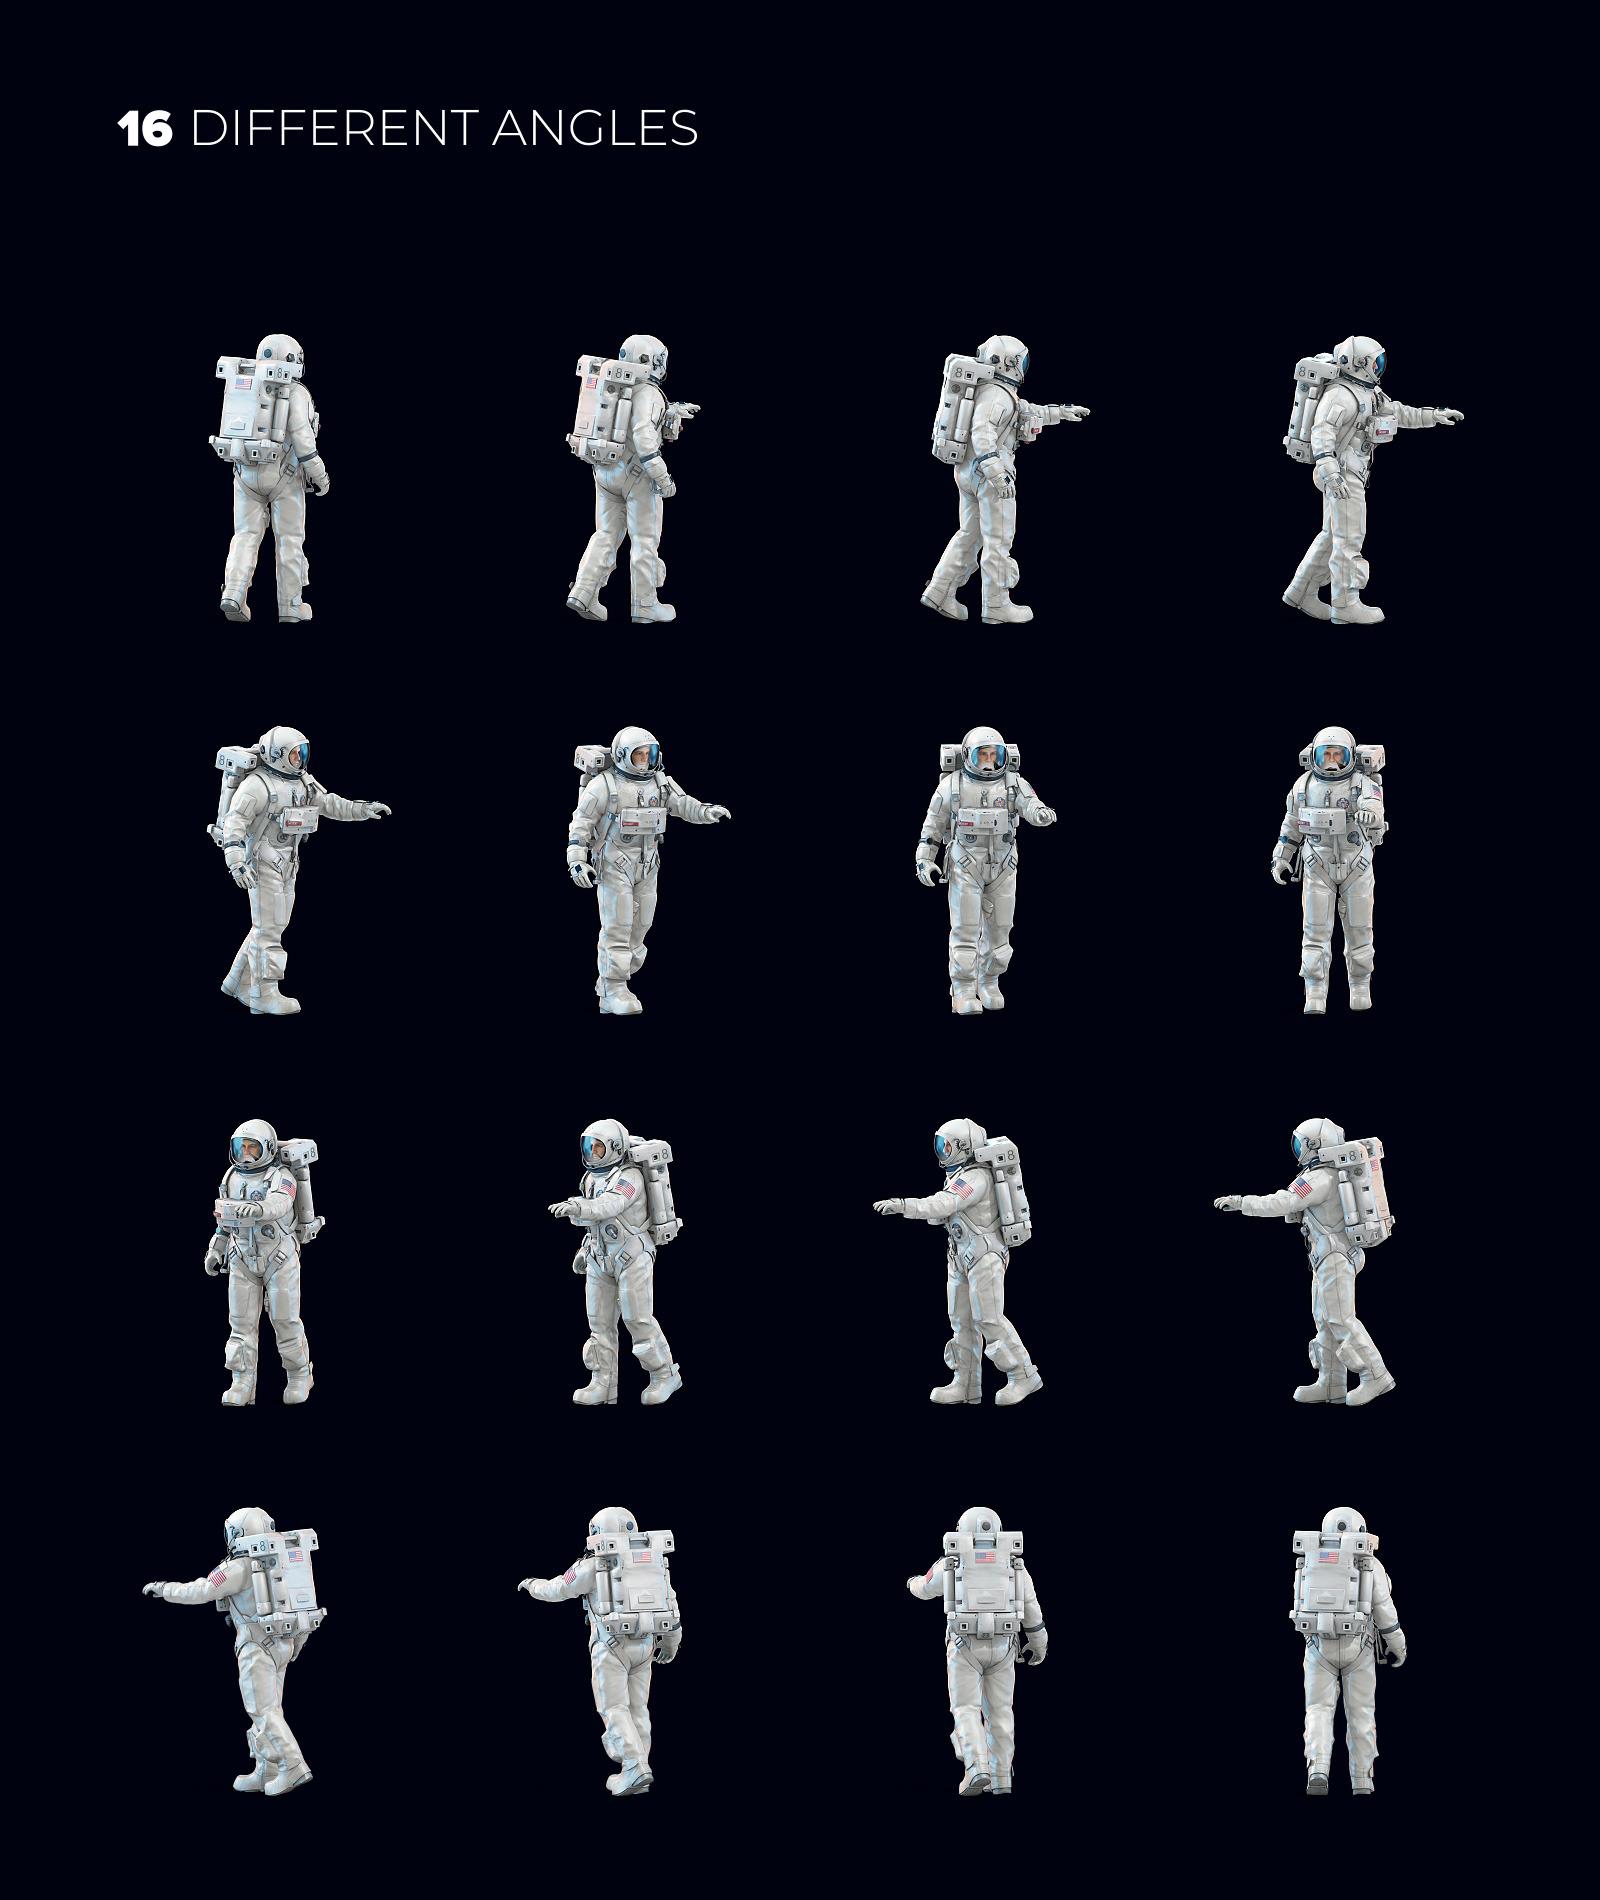 3D Mockup Space Astronaut #3.1